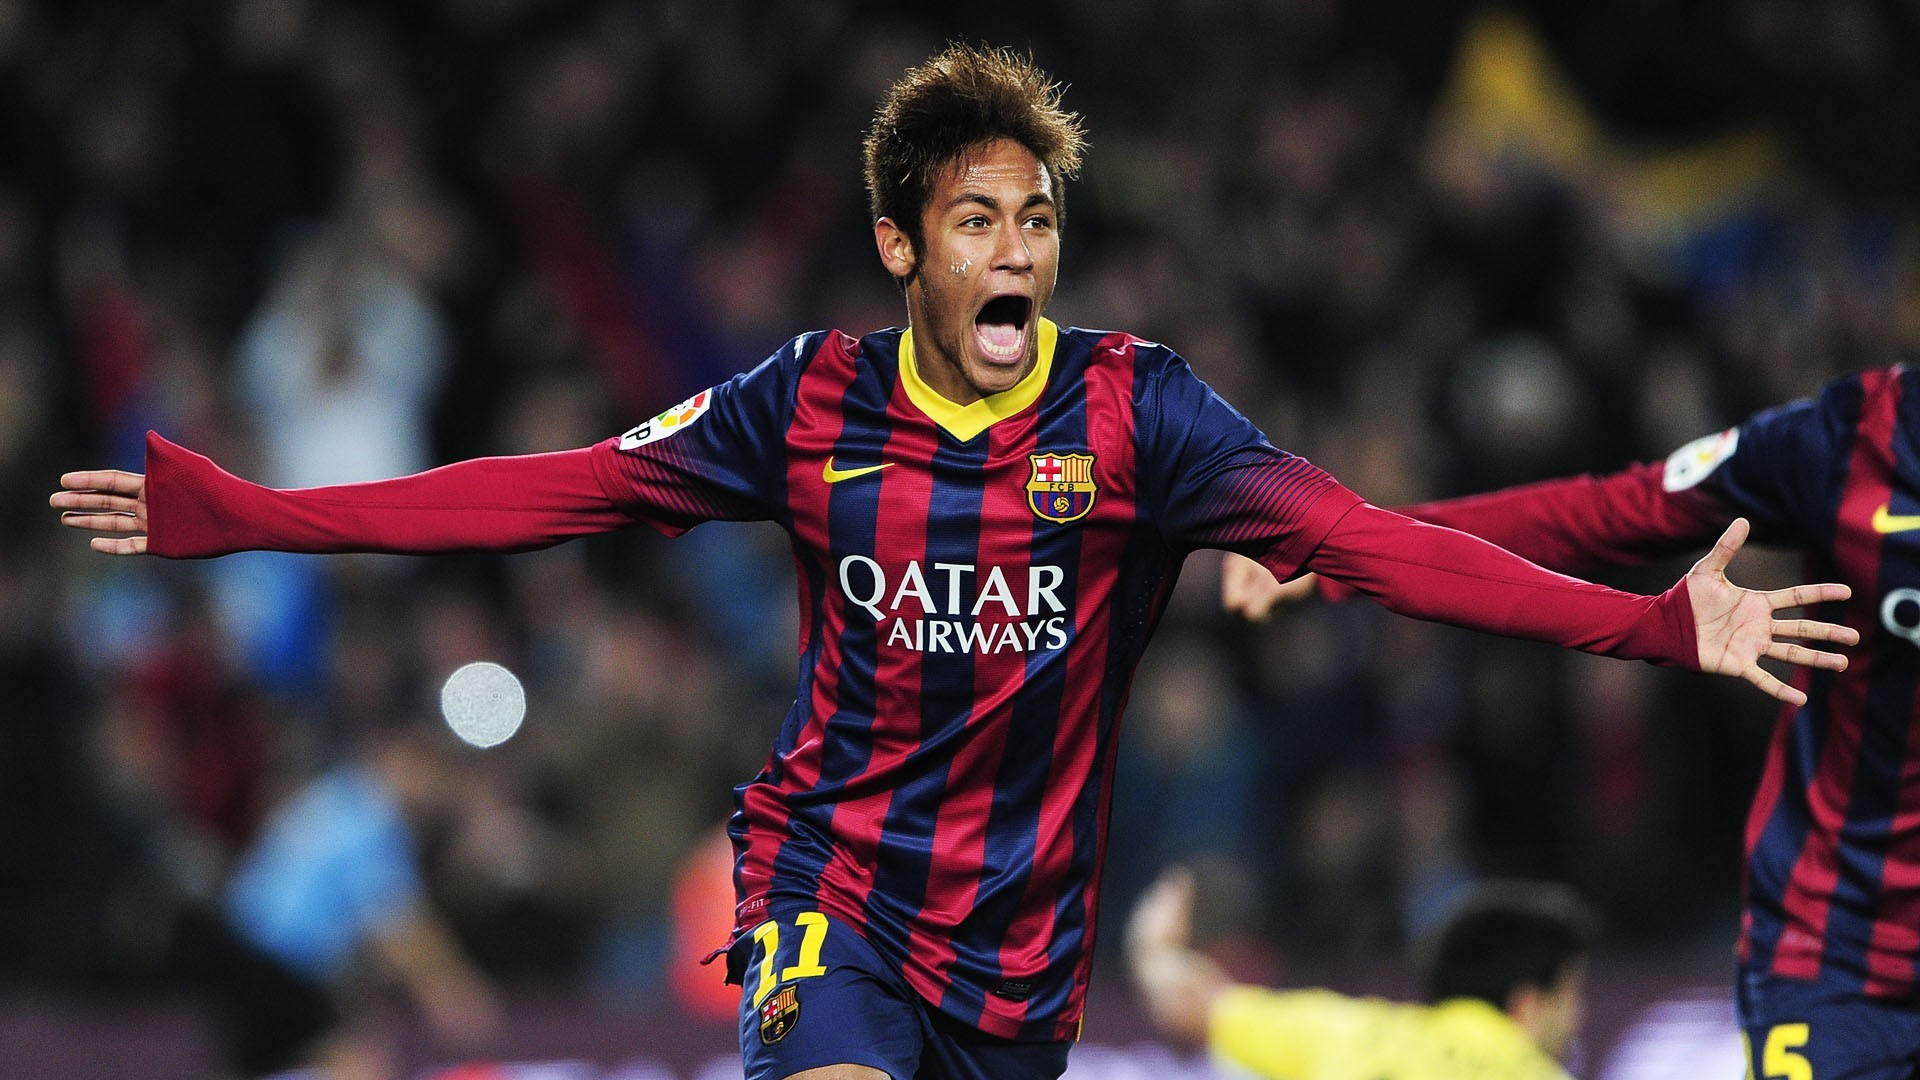 Messi Suarez Neymar Wallpapers 76 Pictures